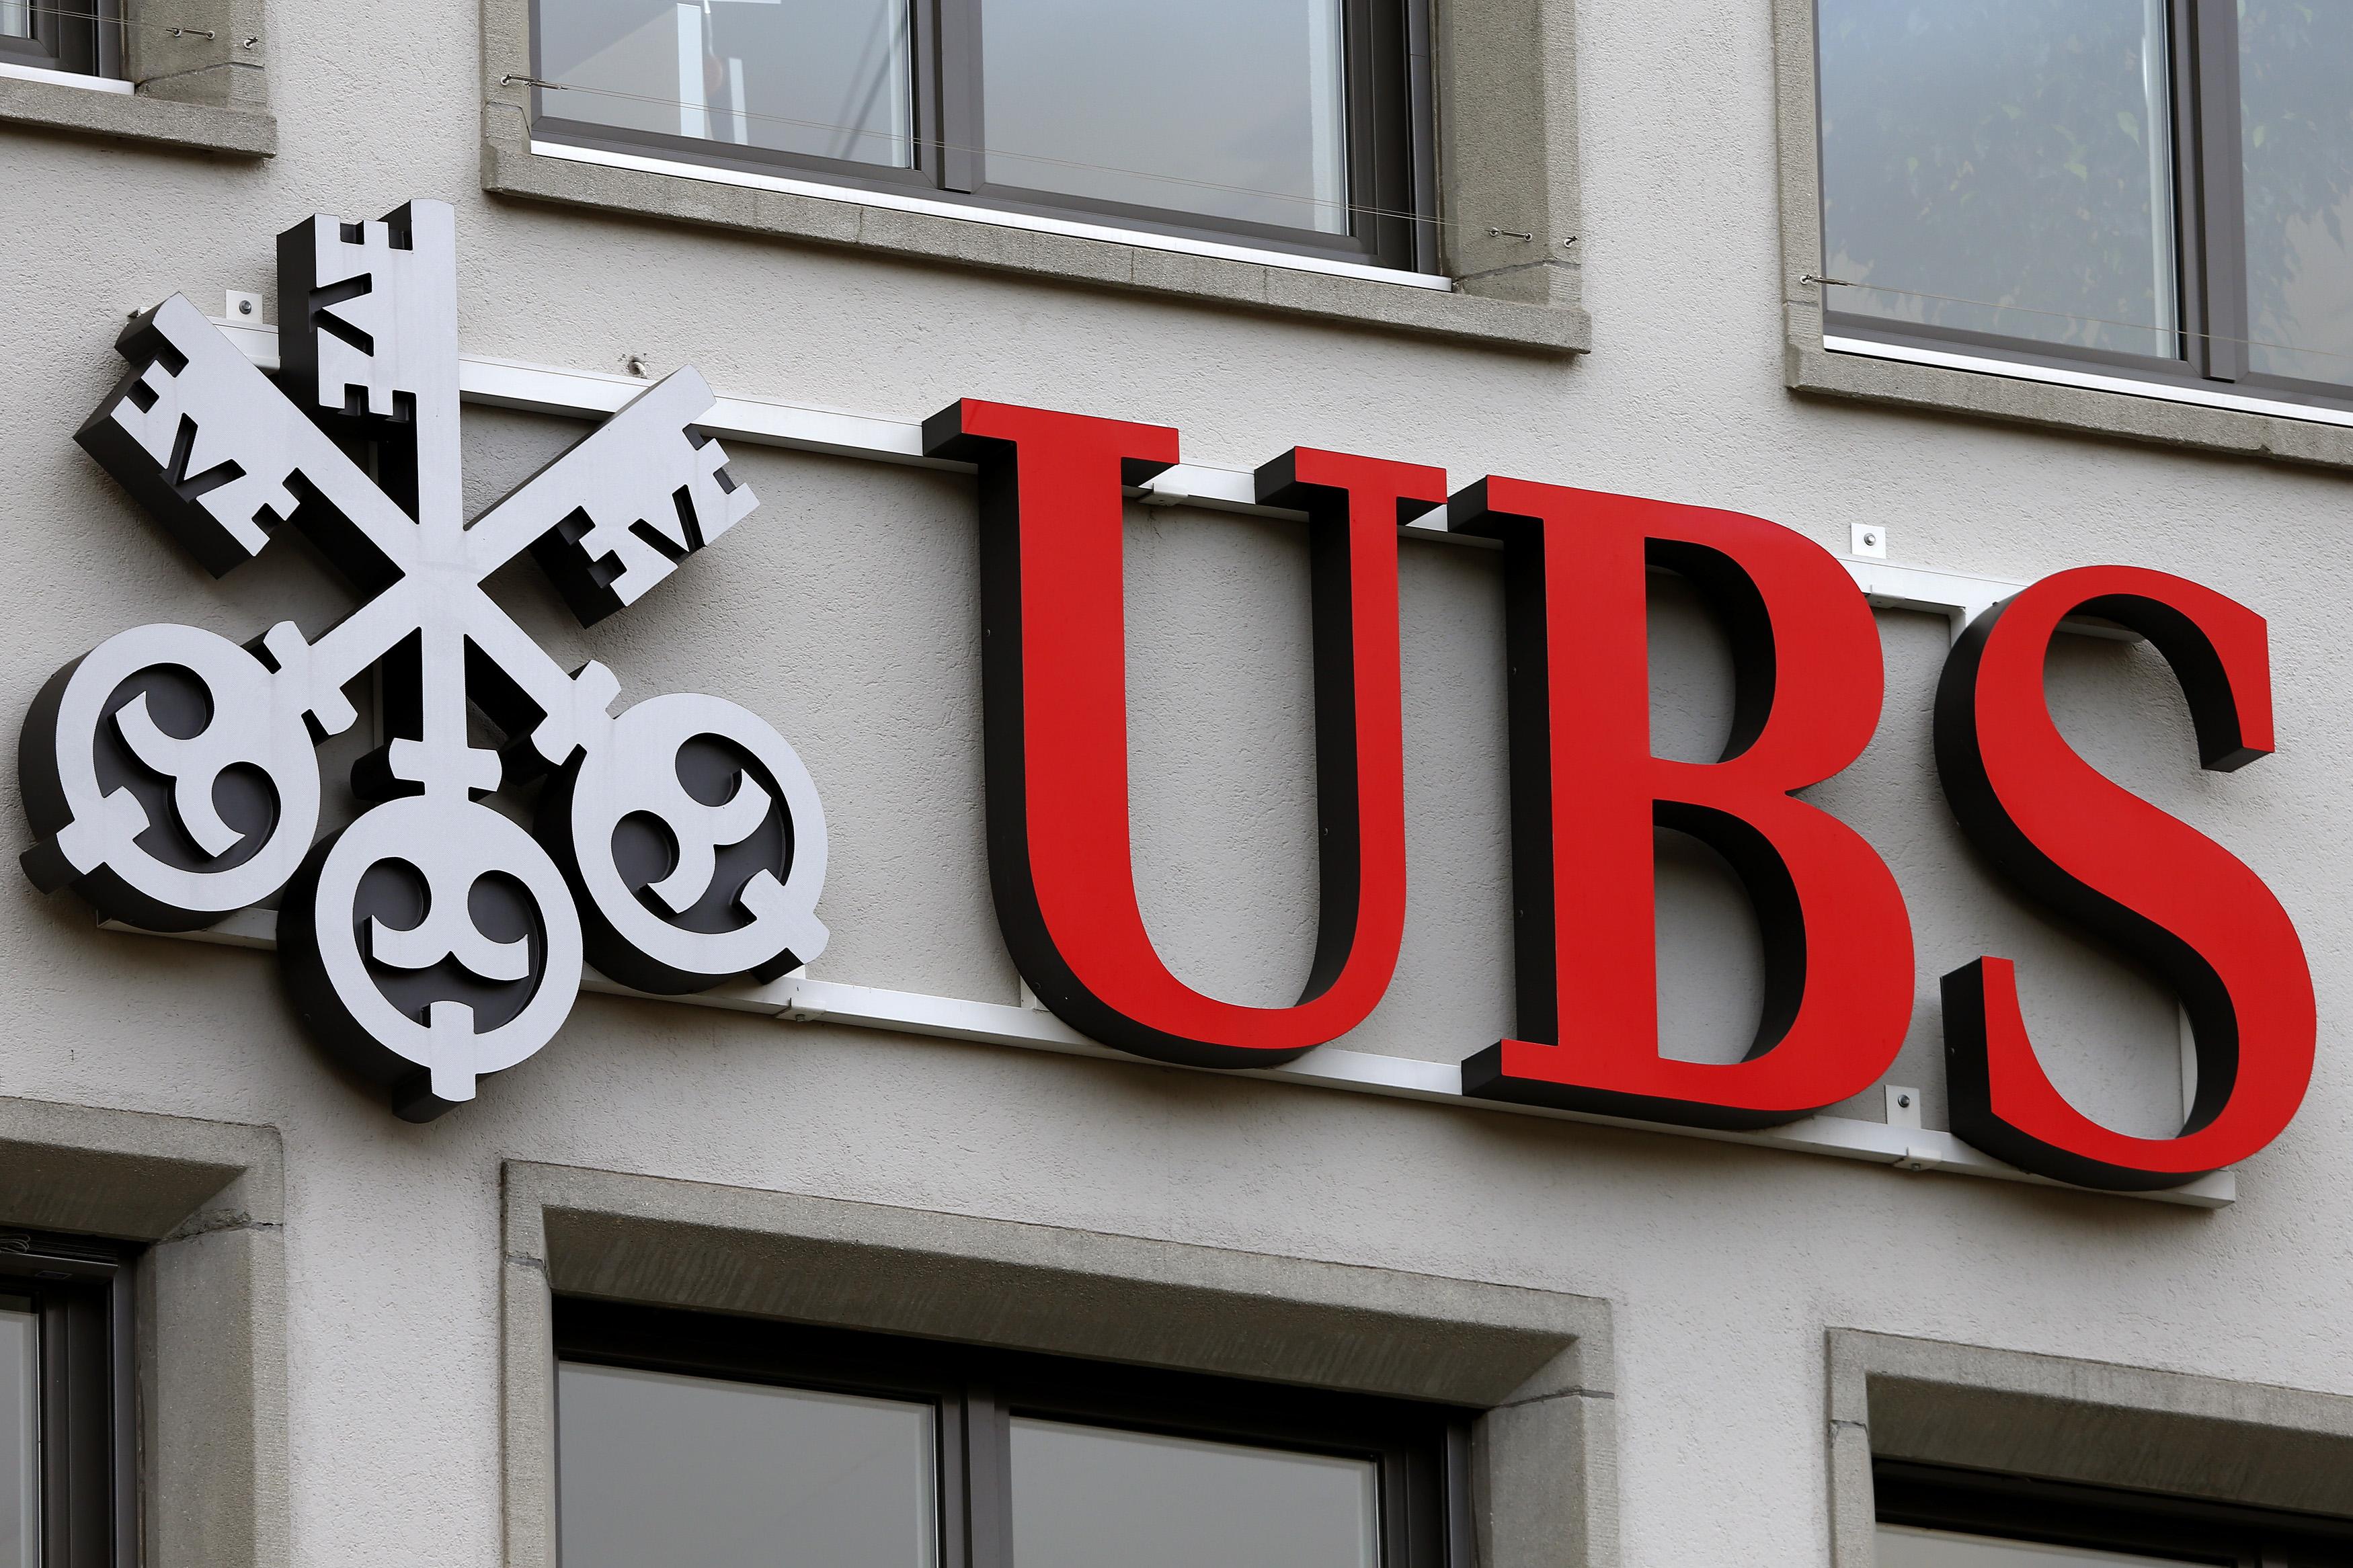 Switzerland's bank UBS warns crypto investors